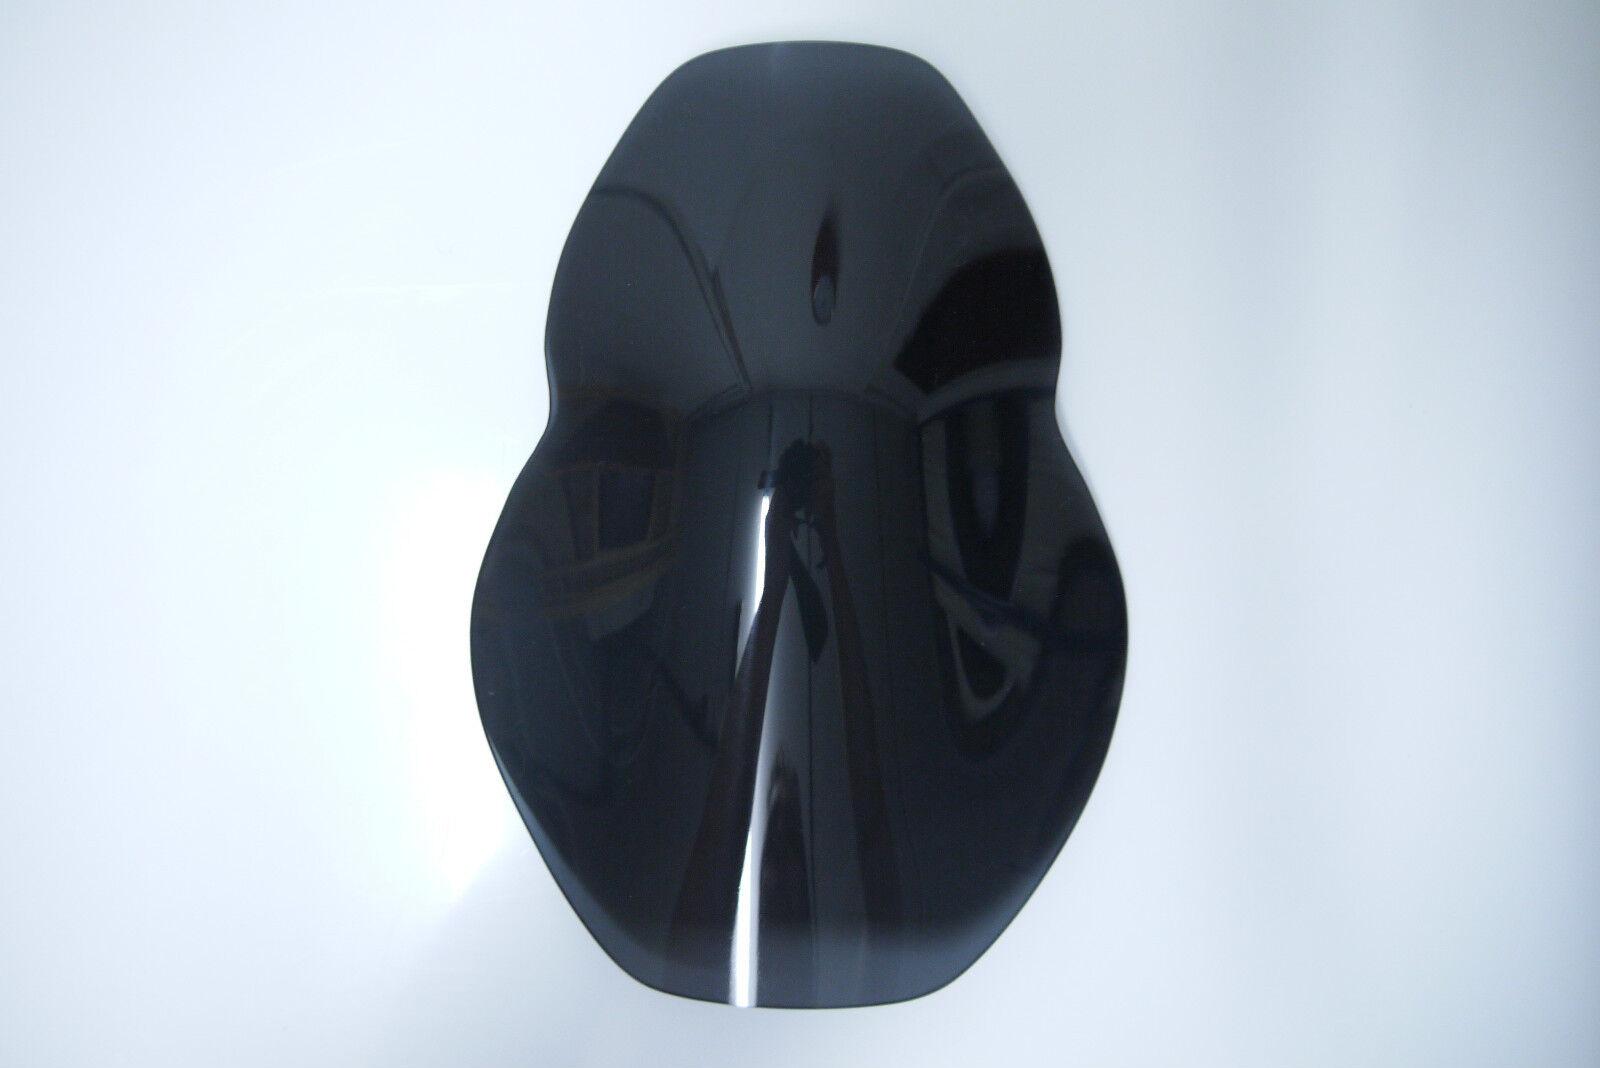 KTM ADVENTURER SLIPSCREENS HEADLIGHT PROTECTOR to fit KTM 990 SUPERDUKE